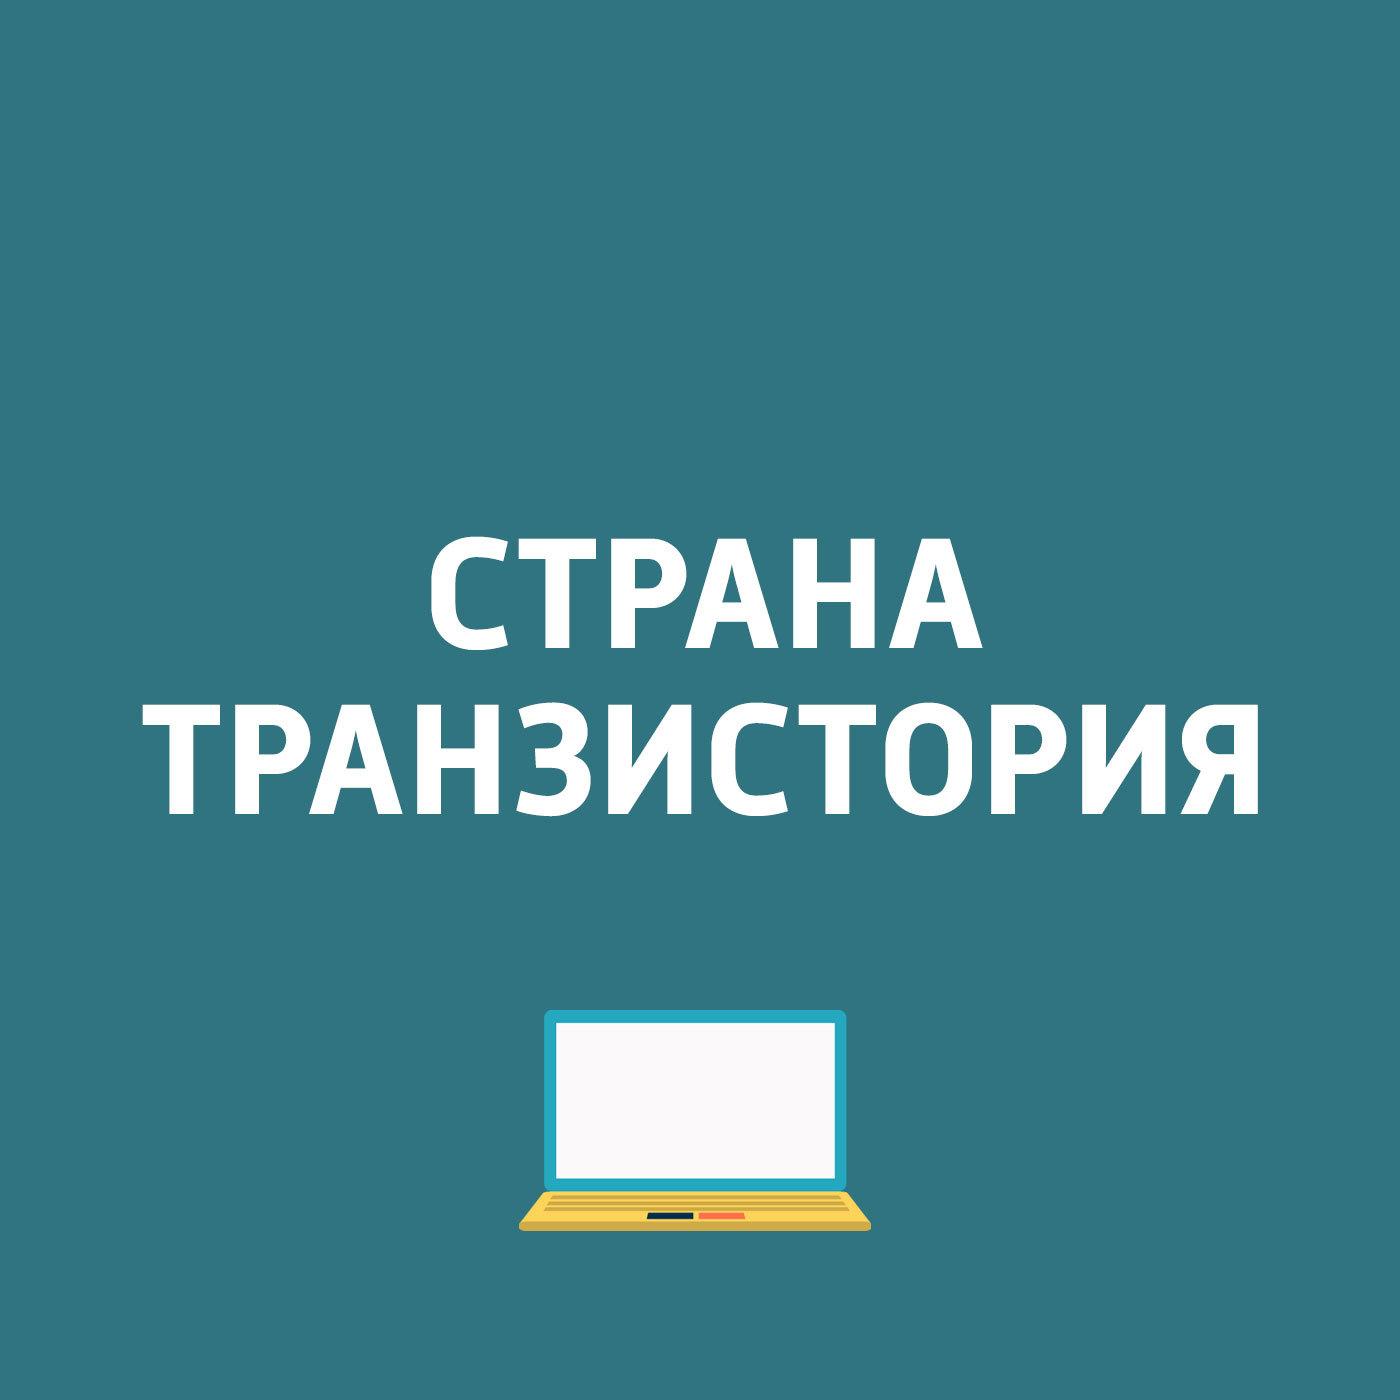 Тест-драйв Hyundai Solaris от Павла Картаева по Пушкинским местам